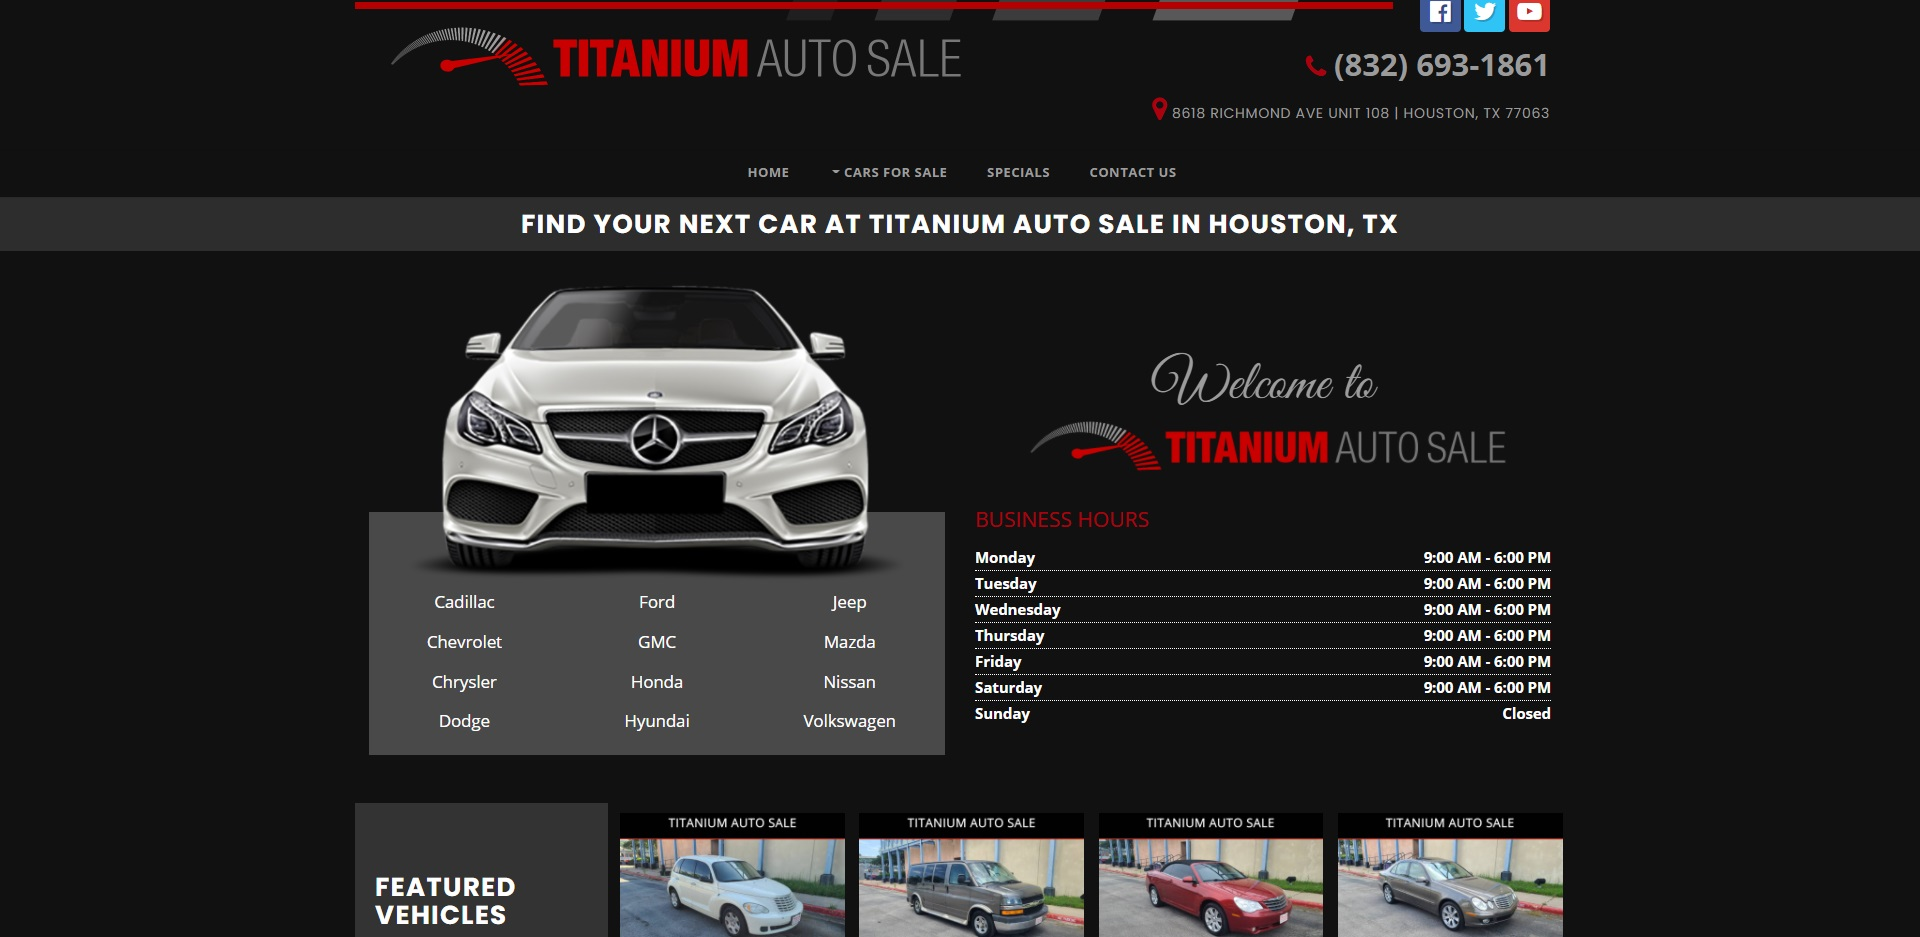 5 Best Car Dealerships in Houston